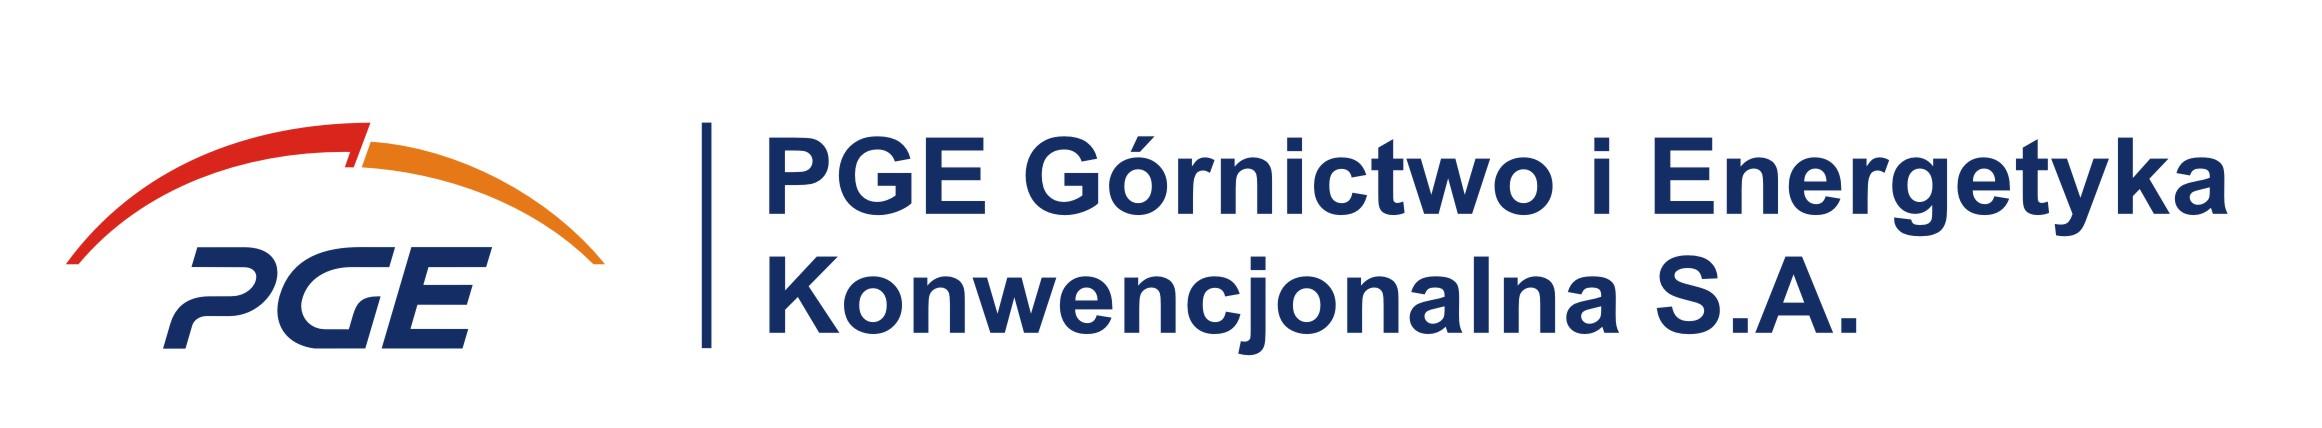 Faculty Supporter - PGE Górnictwo i Energetyka Konwencjonalna S.A.